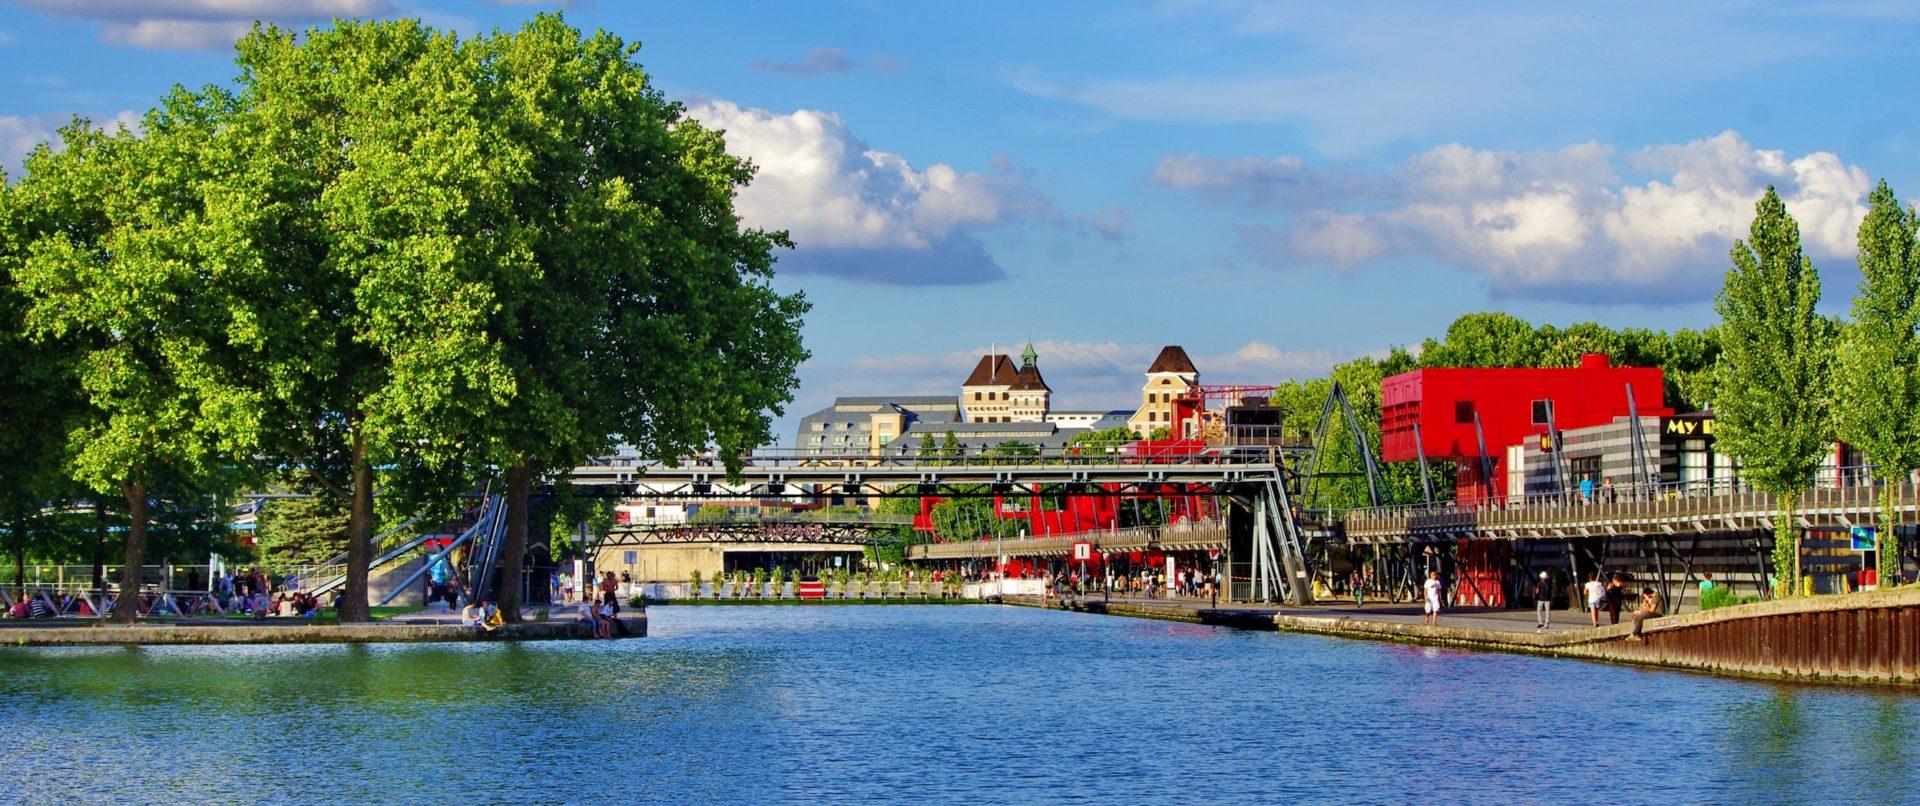 paris-cruise-picnic-boules-private-activity